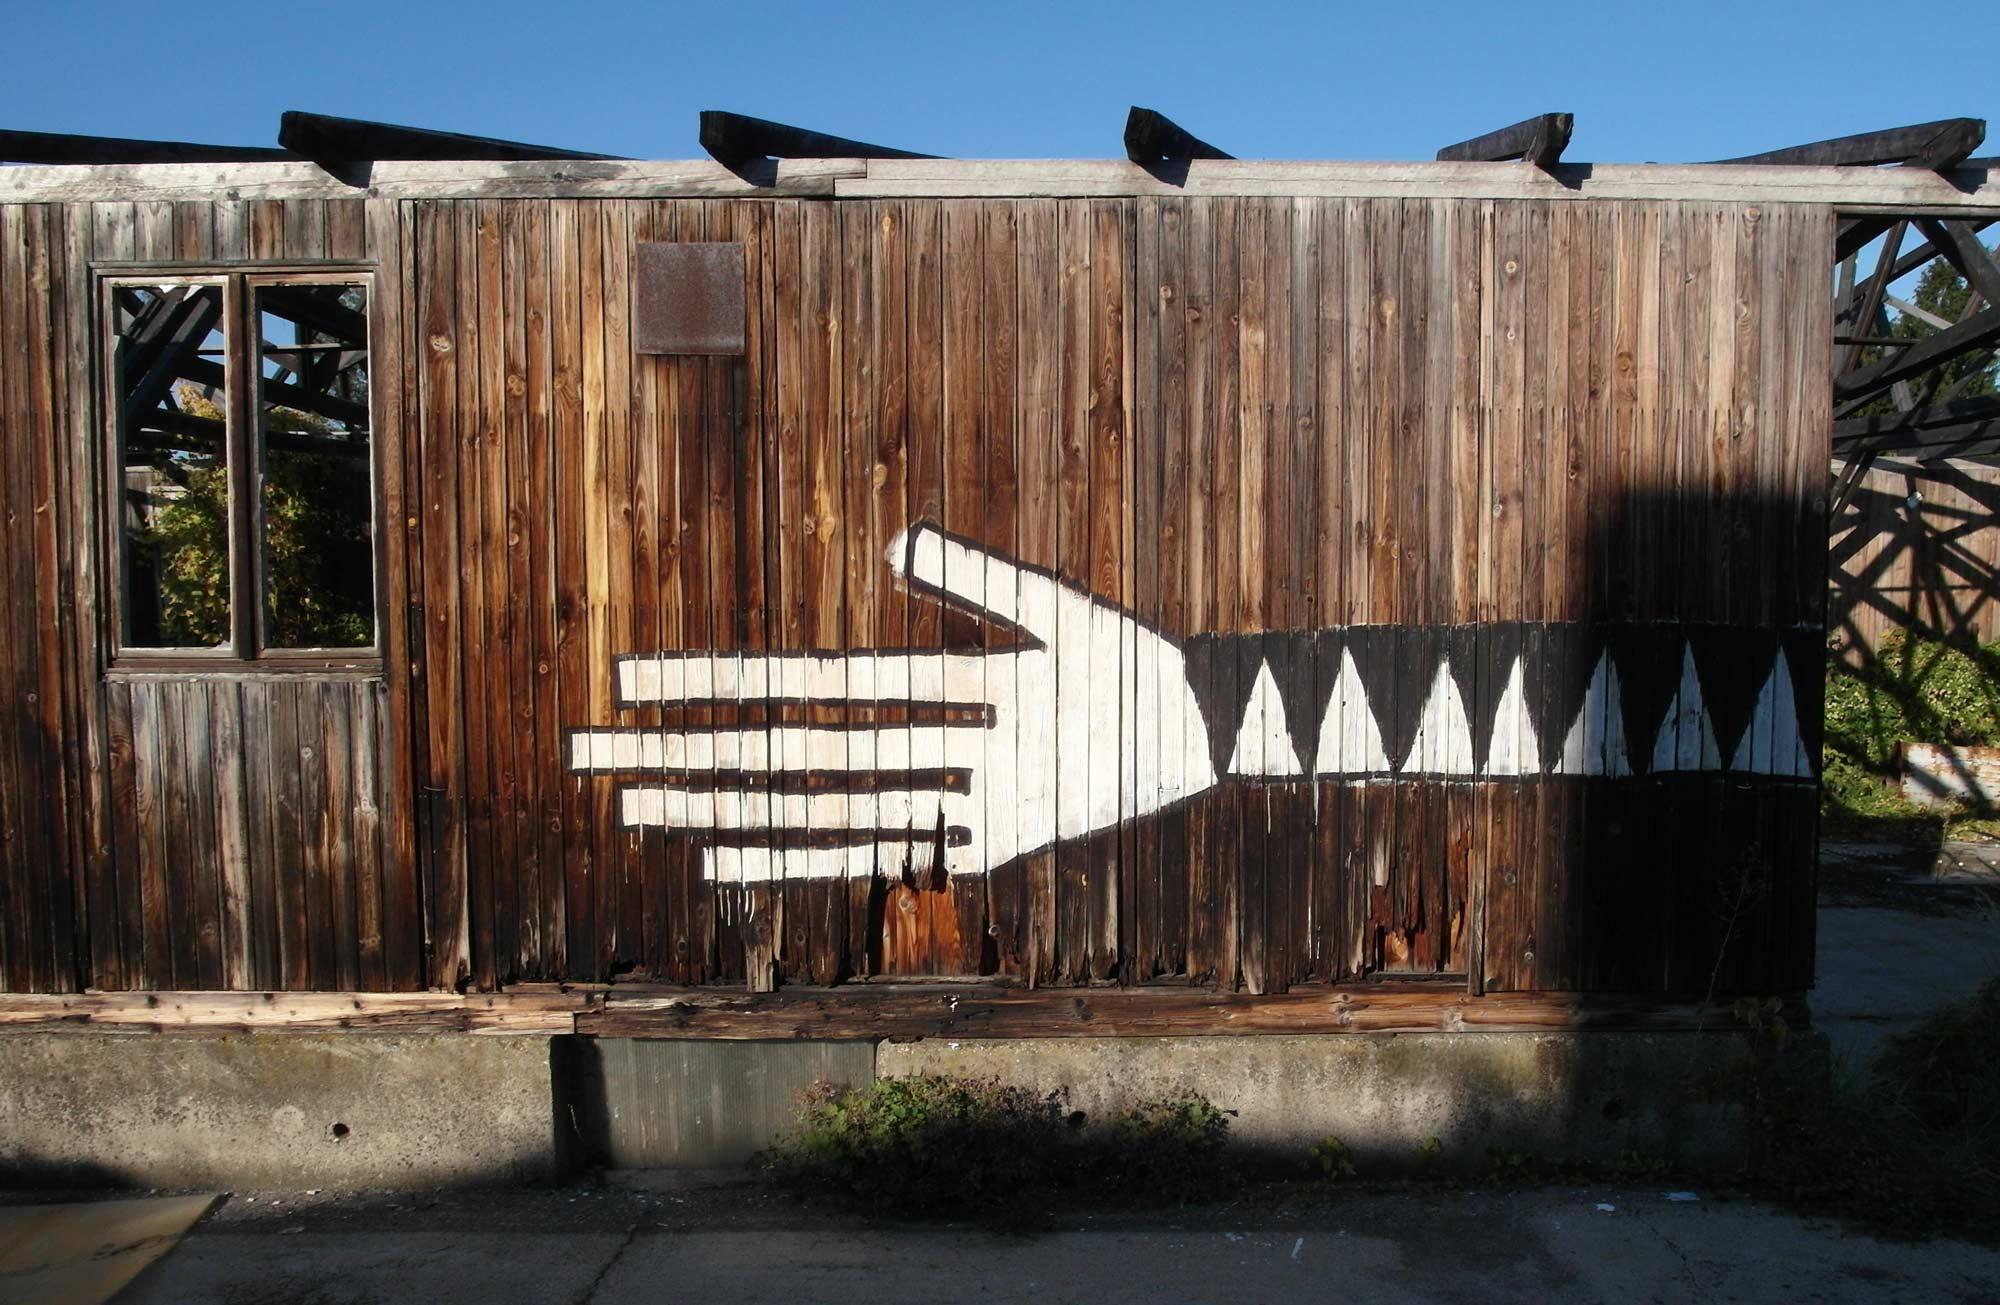 lym_moreno_murals_15